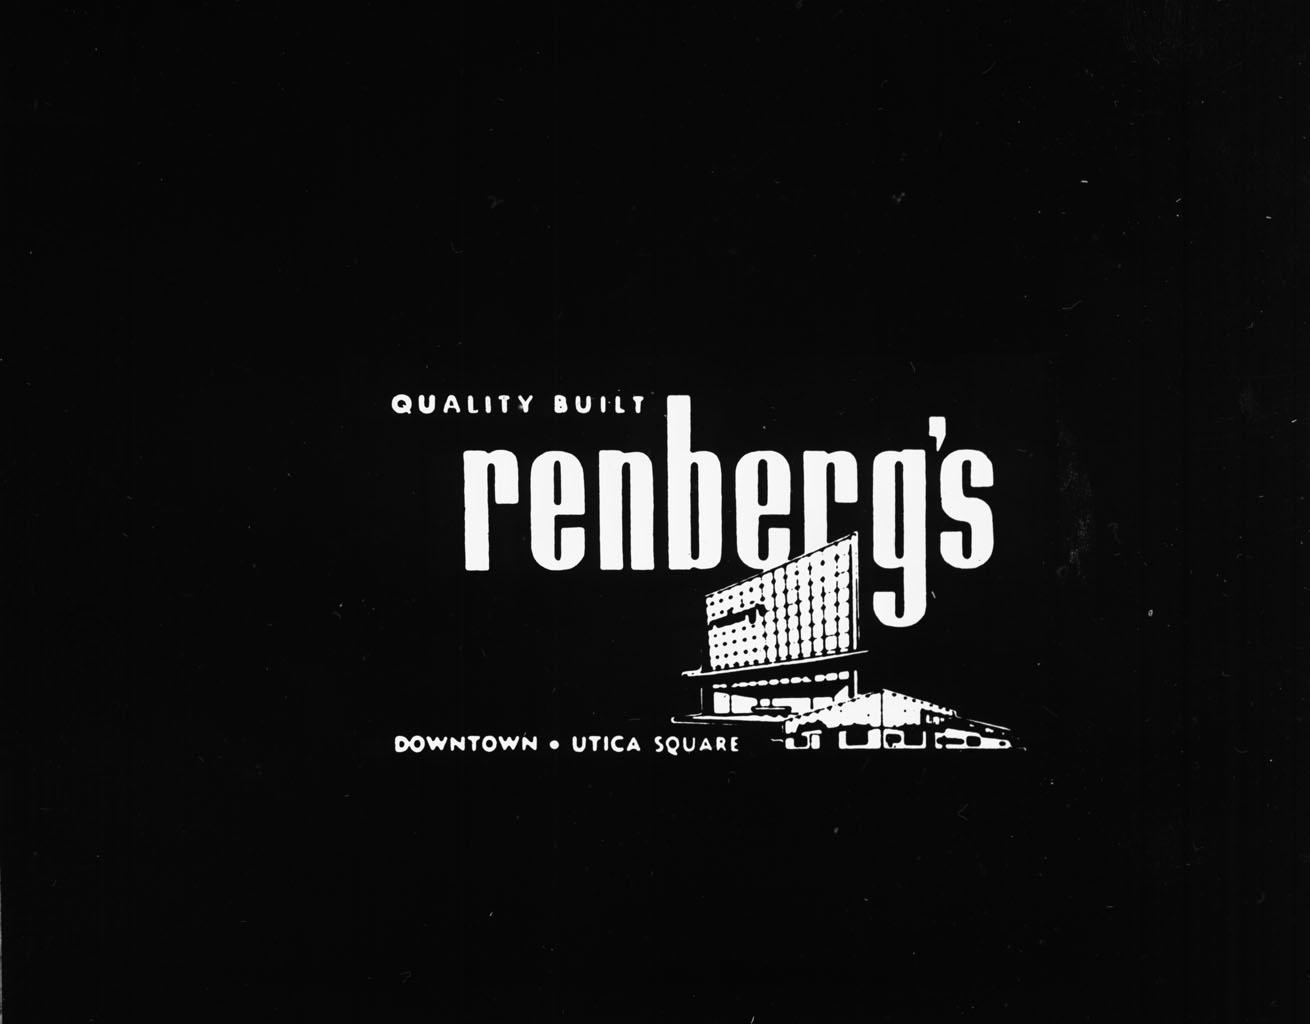 renberg's advertisement